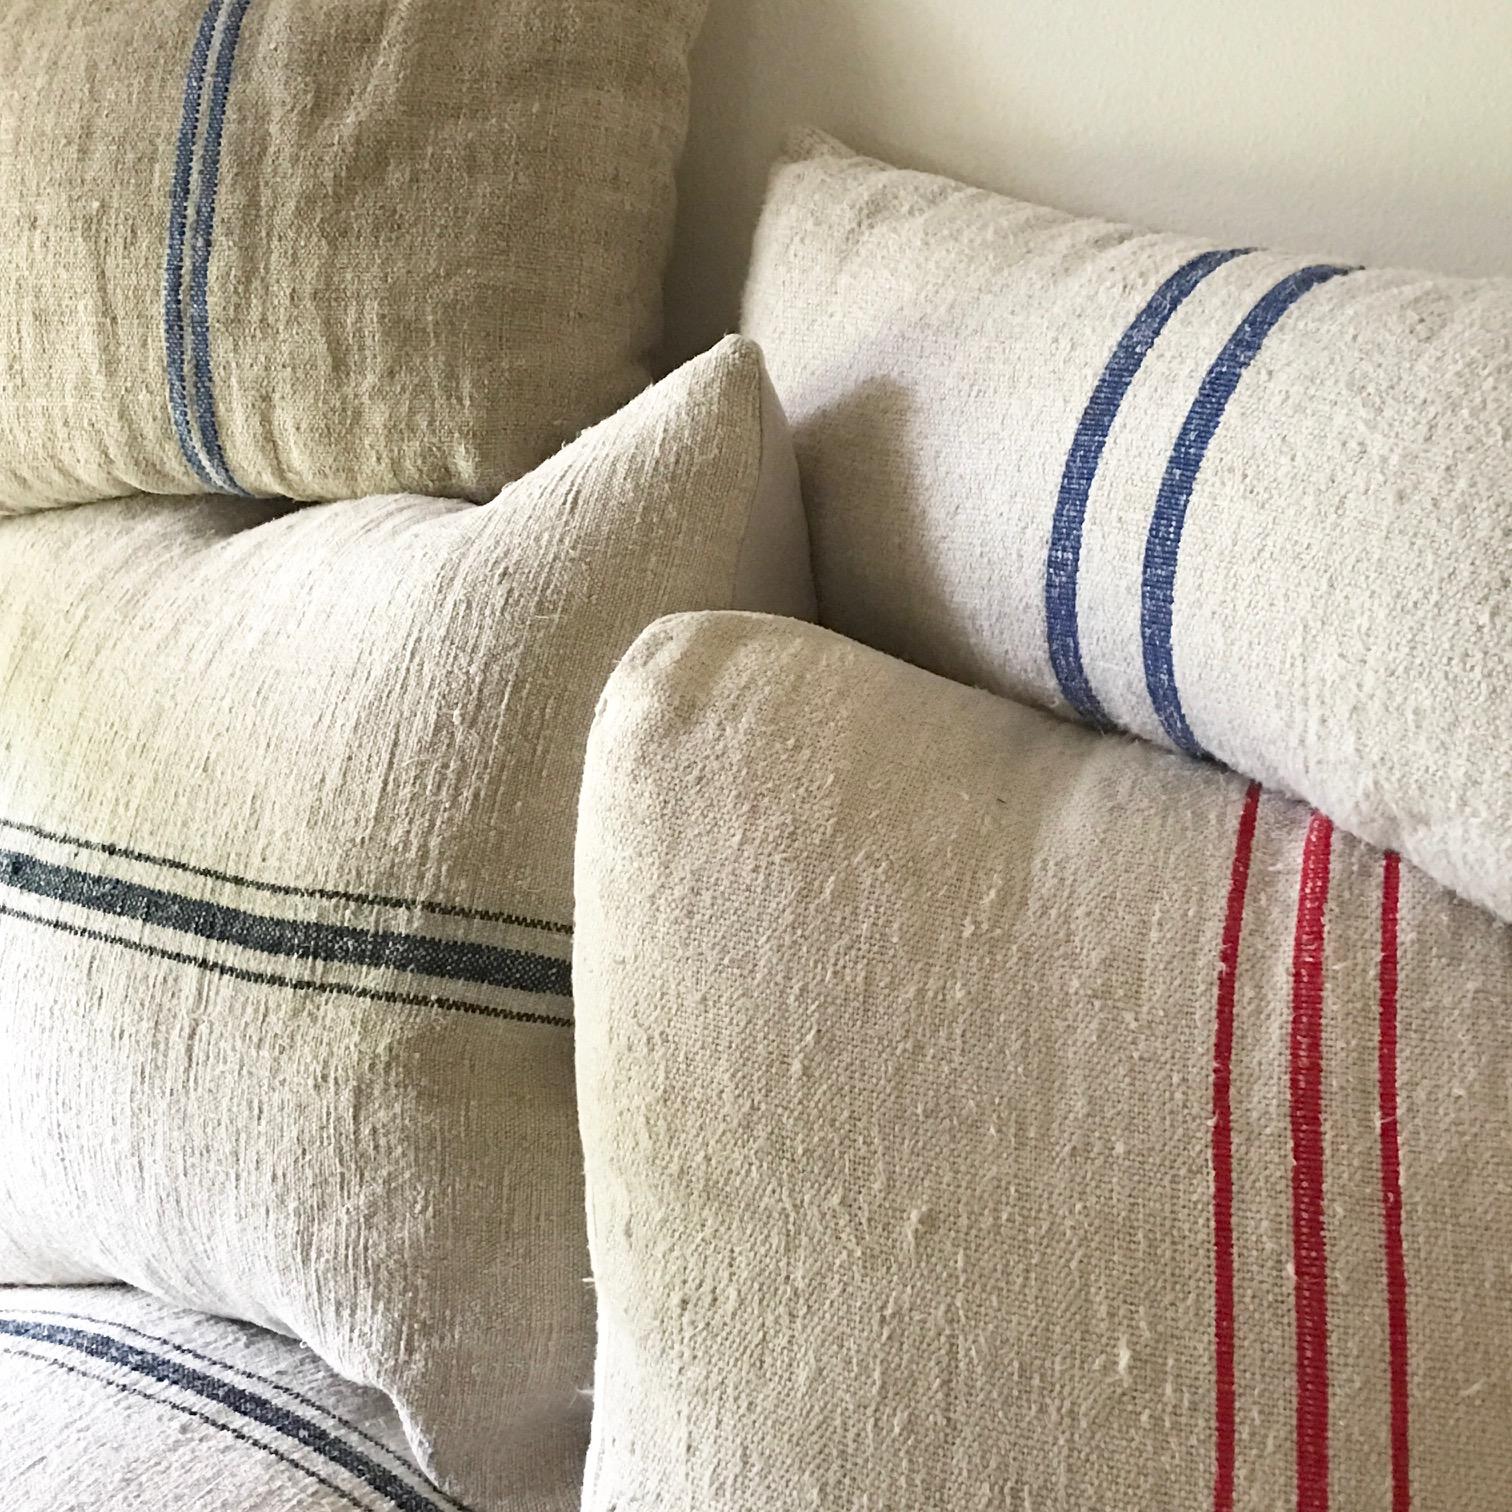 Little Farmstead: DIY Grain Sack Pillows (And Where to Buy ...